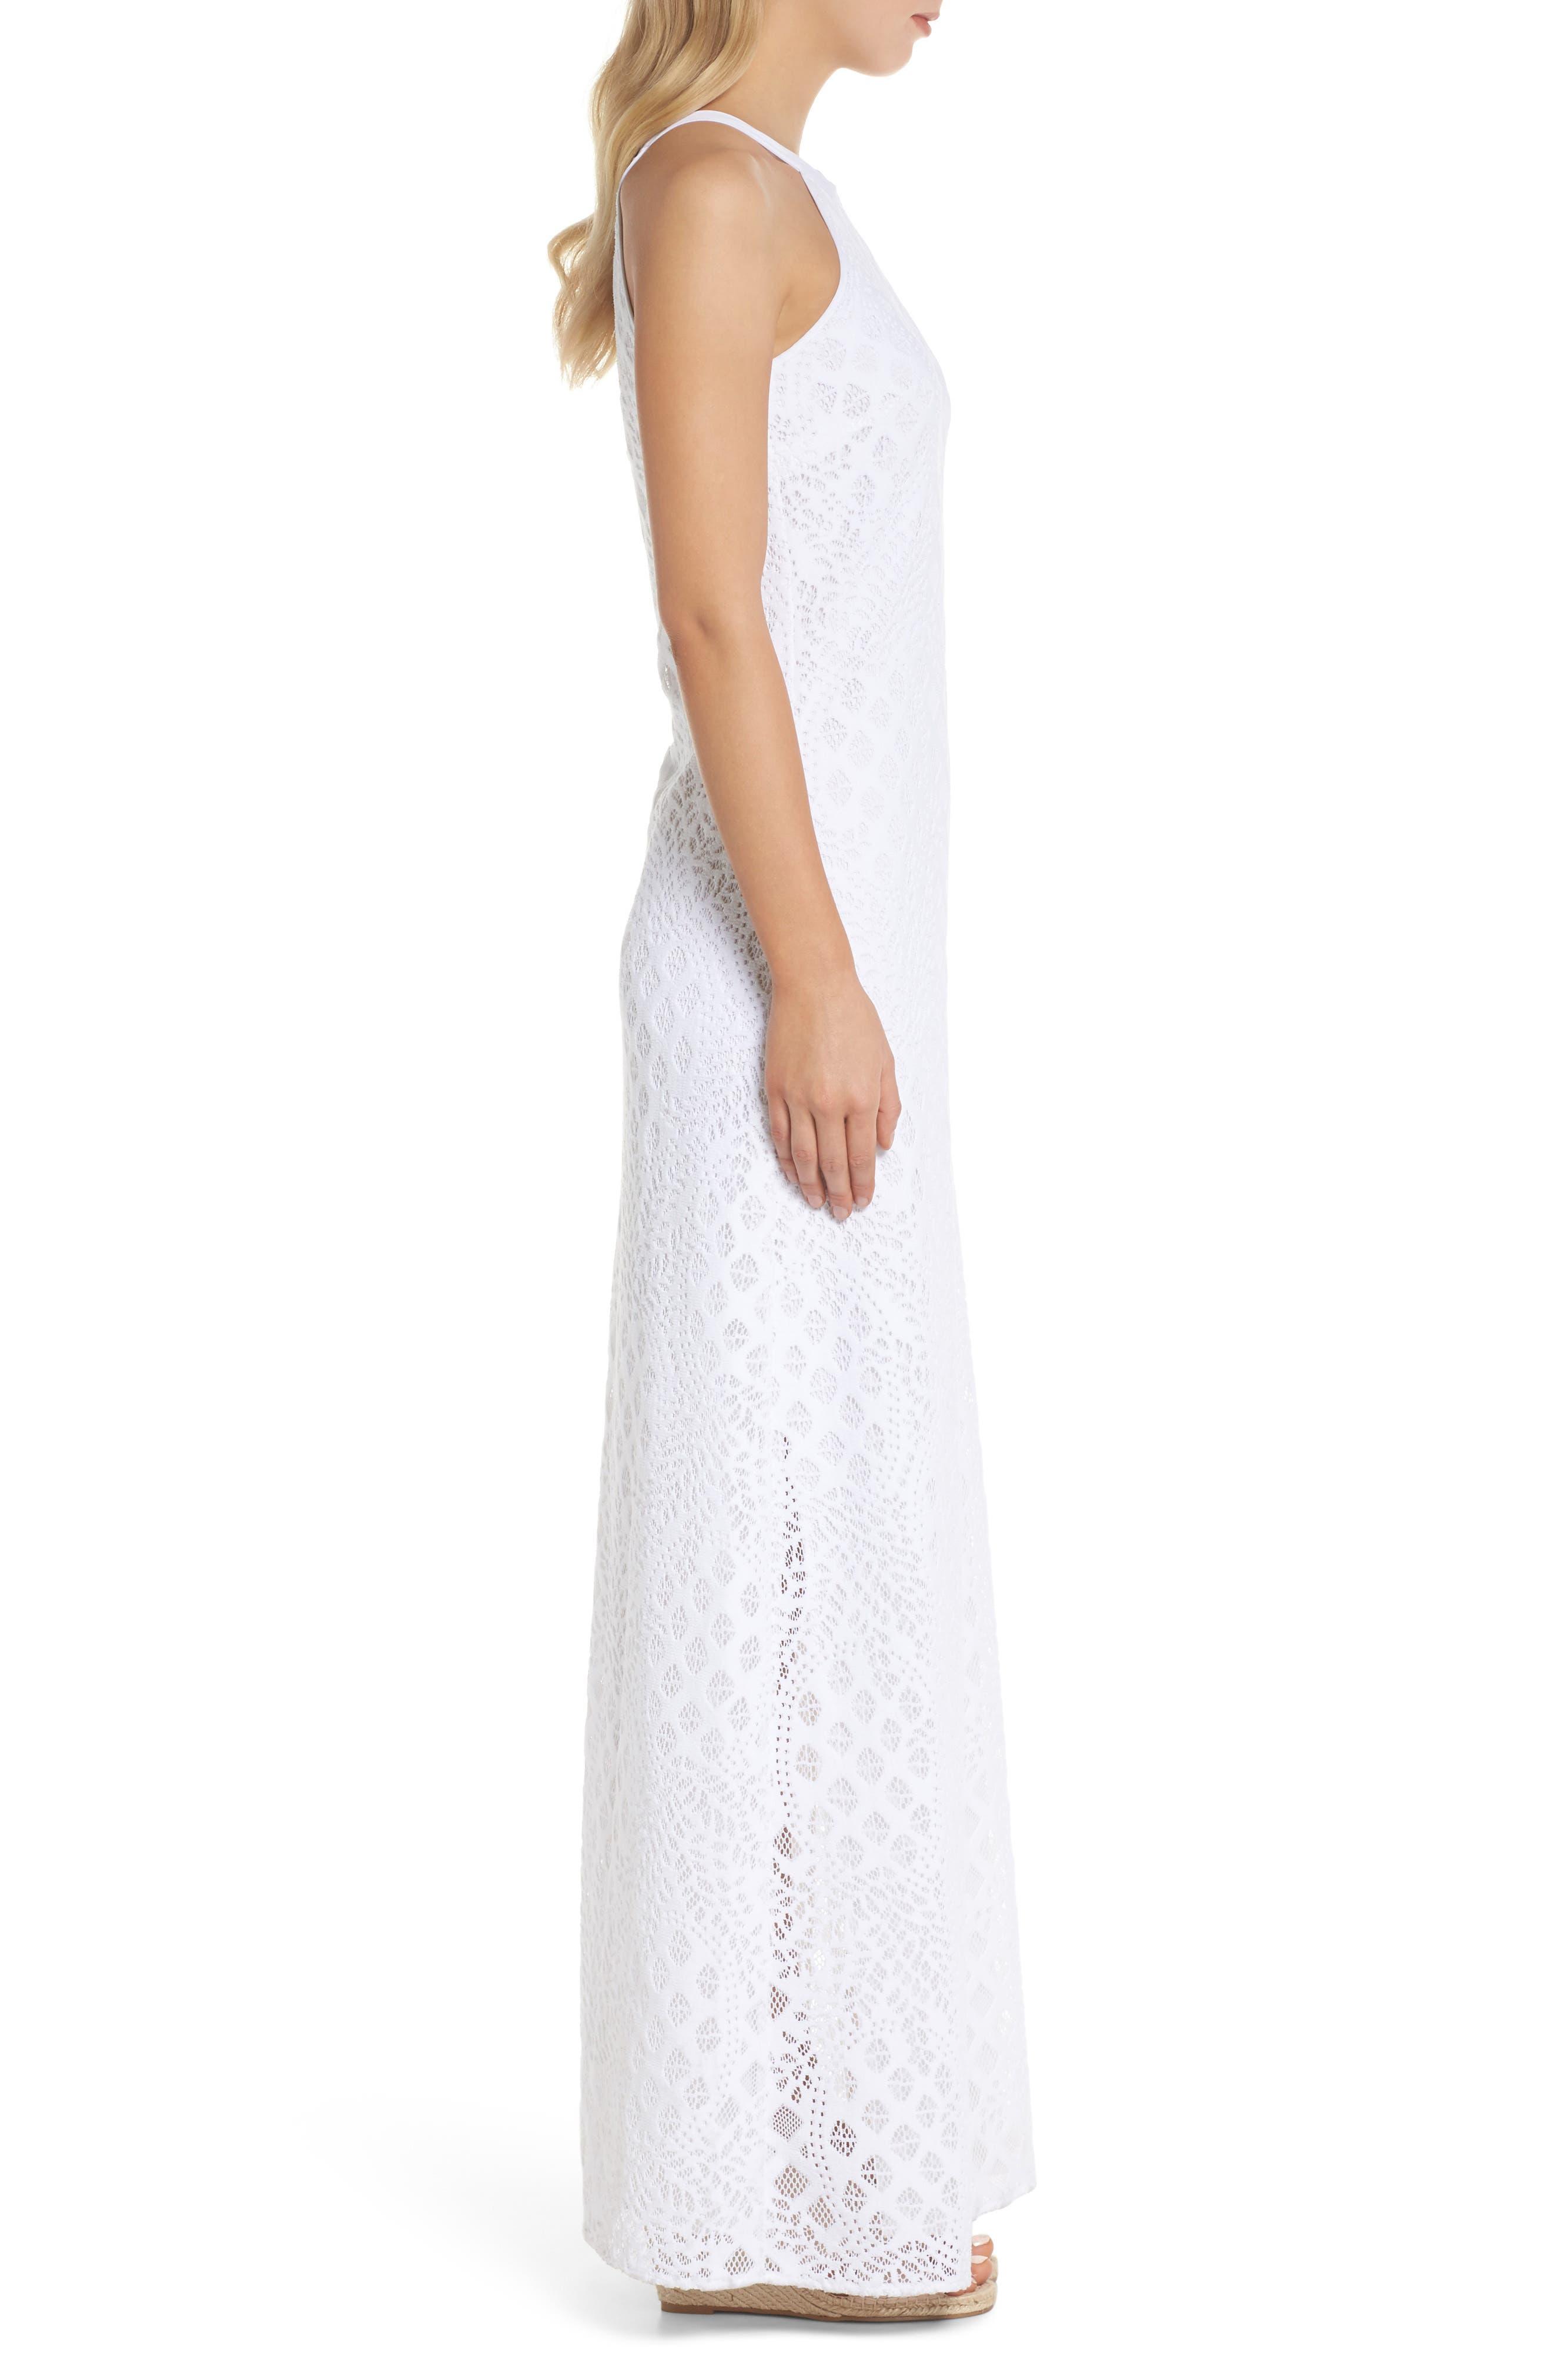 Pearl Maxi Dress,                             Alternate thumbnail 3, color,                             Resort White Pineapple Lace